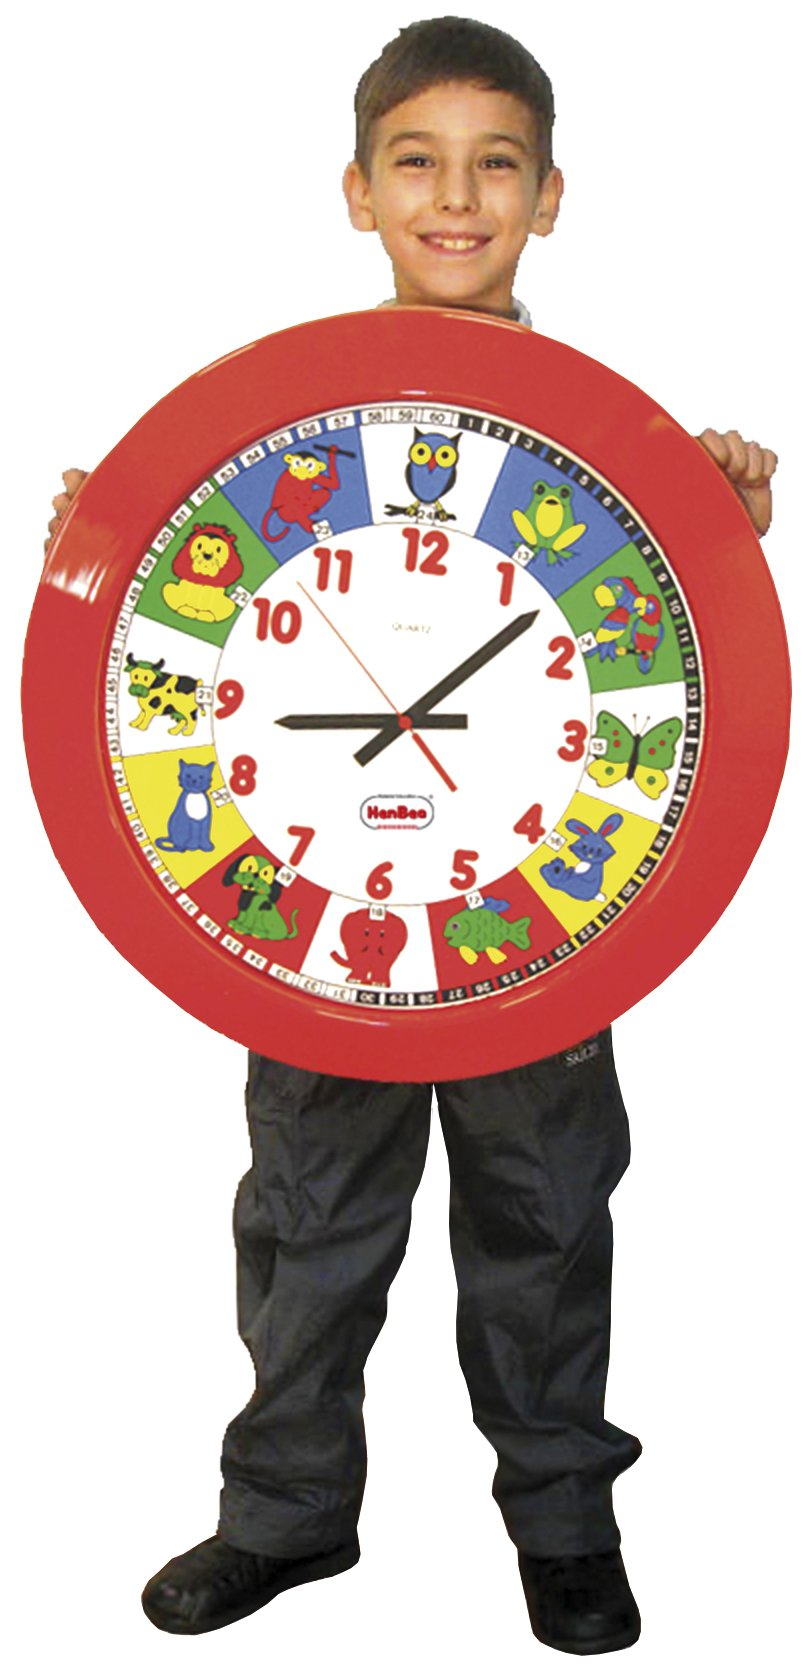 Eduplay Eduplay120127 Learning Mega Clock, 60 cm, Multi-Color